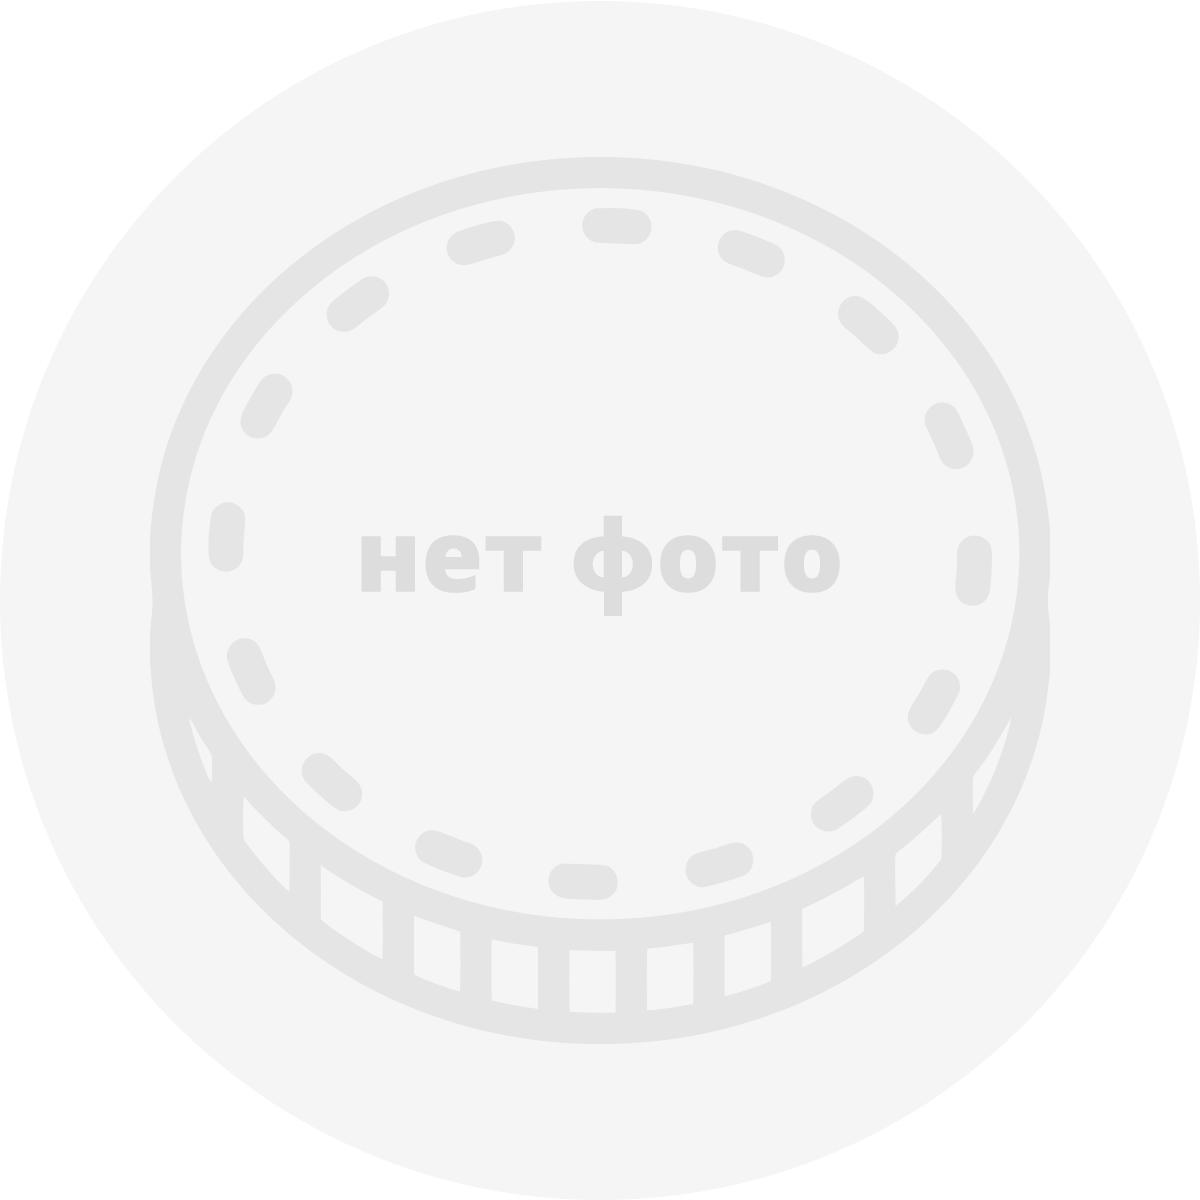 Латвия, 2 1/2 евро (2017 г.)